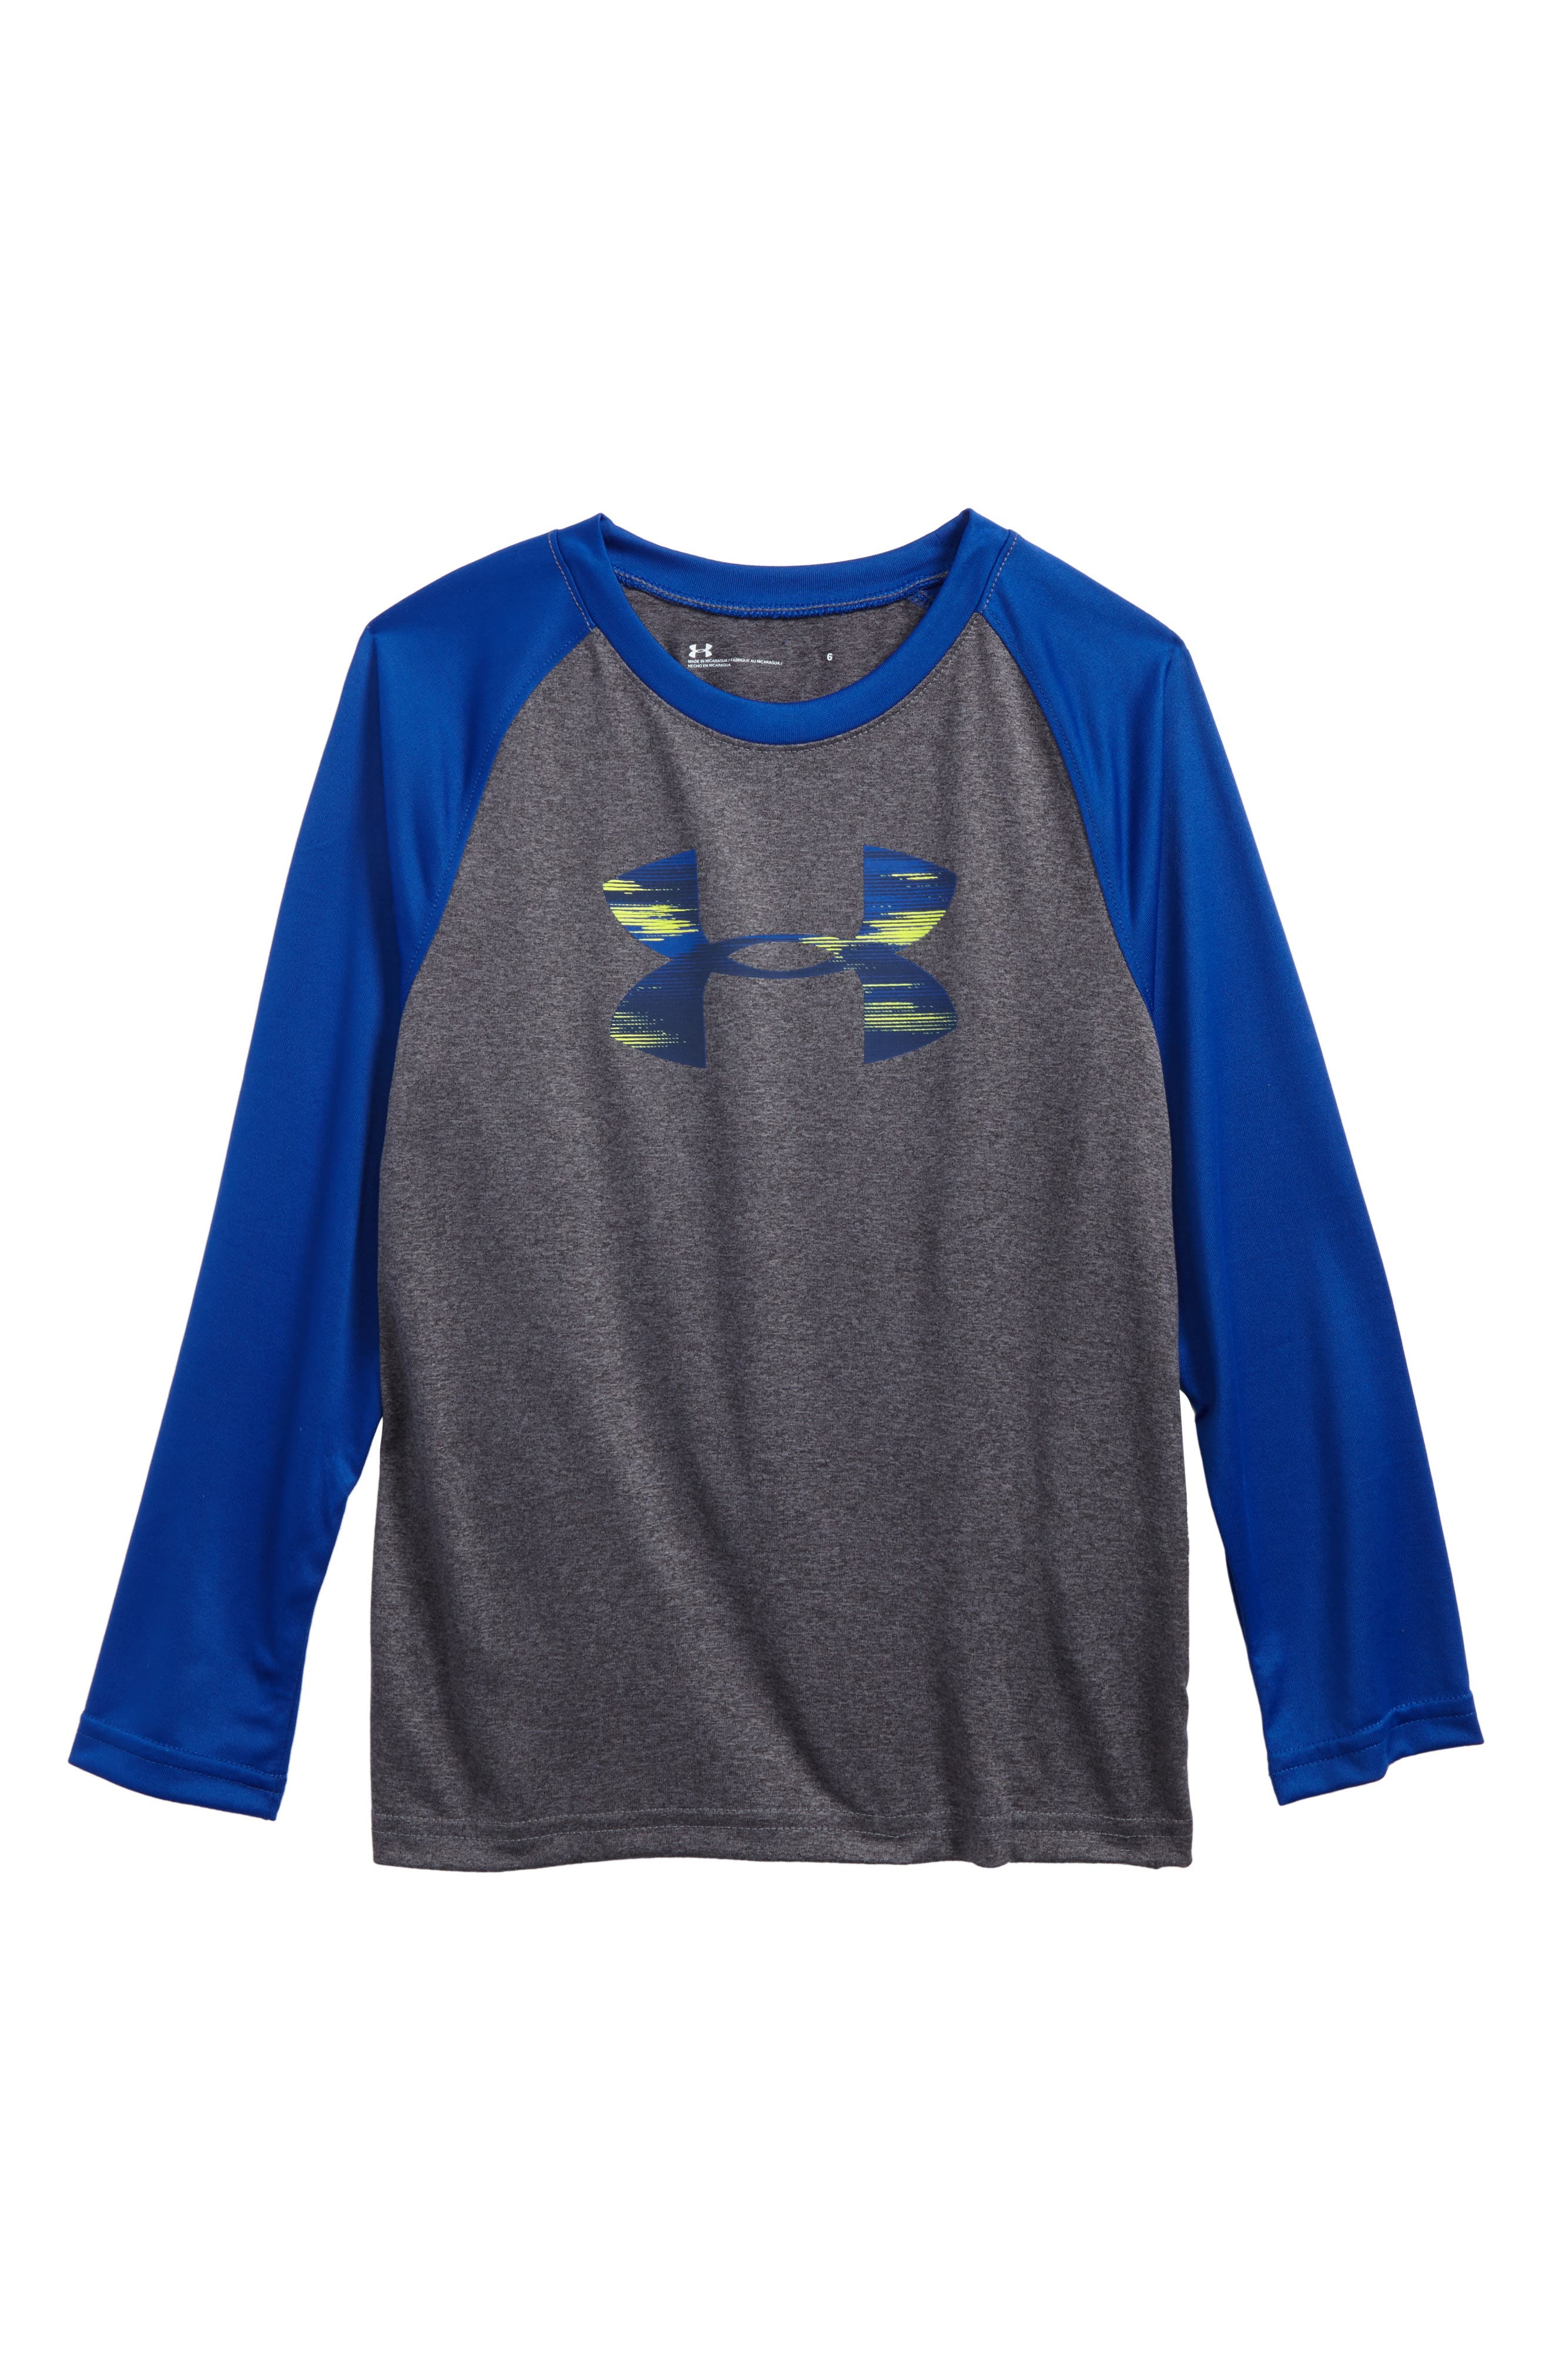 Under Armour Accelerate Big Logo T-Shirt (Toddler Boys & Little Boys)